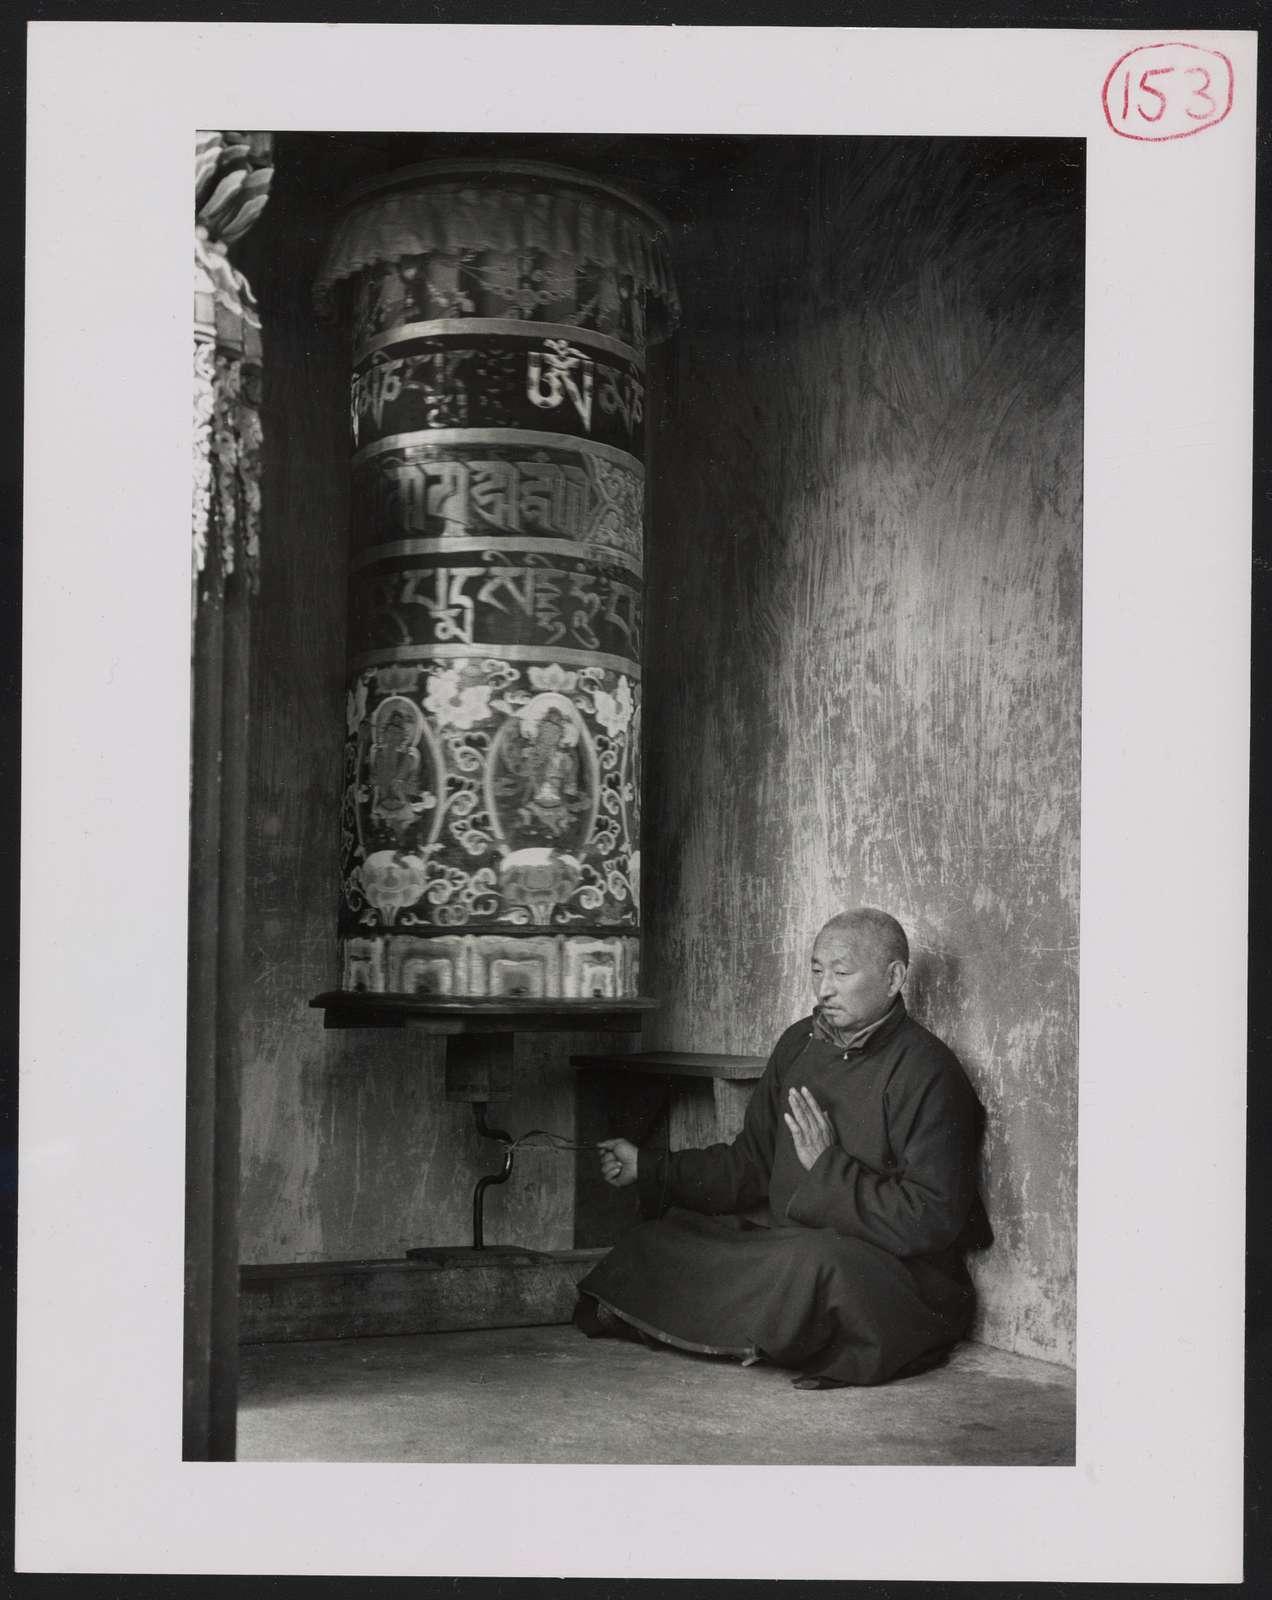 [Shinglay Lama turning giant prayer wheel]